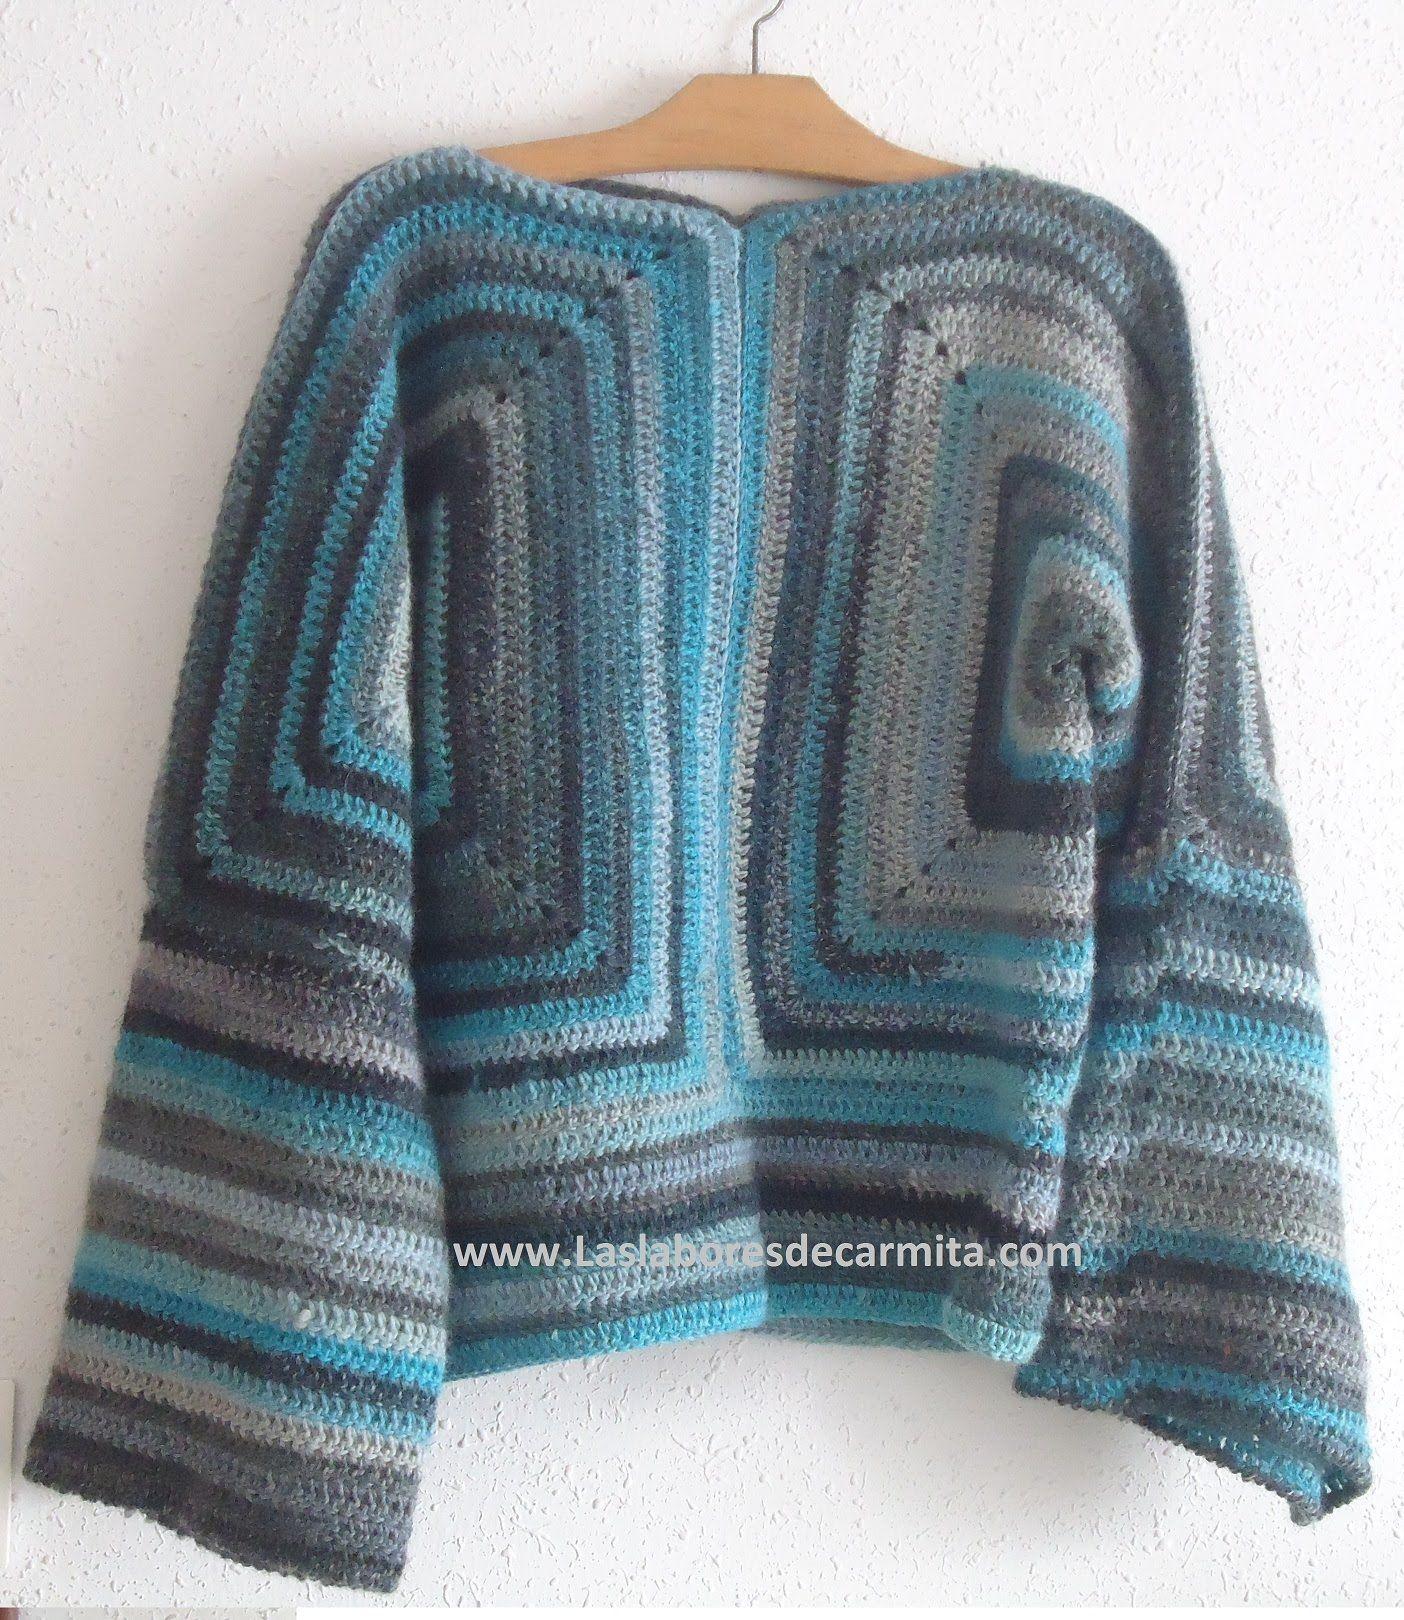 Como hacer jersey chaqueta crochet ganchillo paso a paso - Como hacer un jersey de punto ...